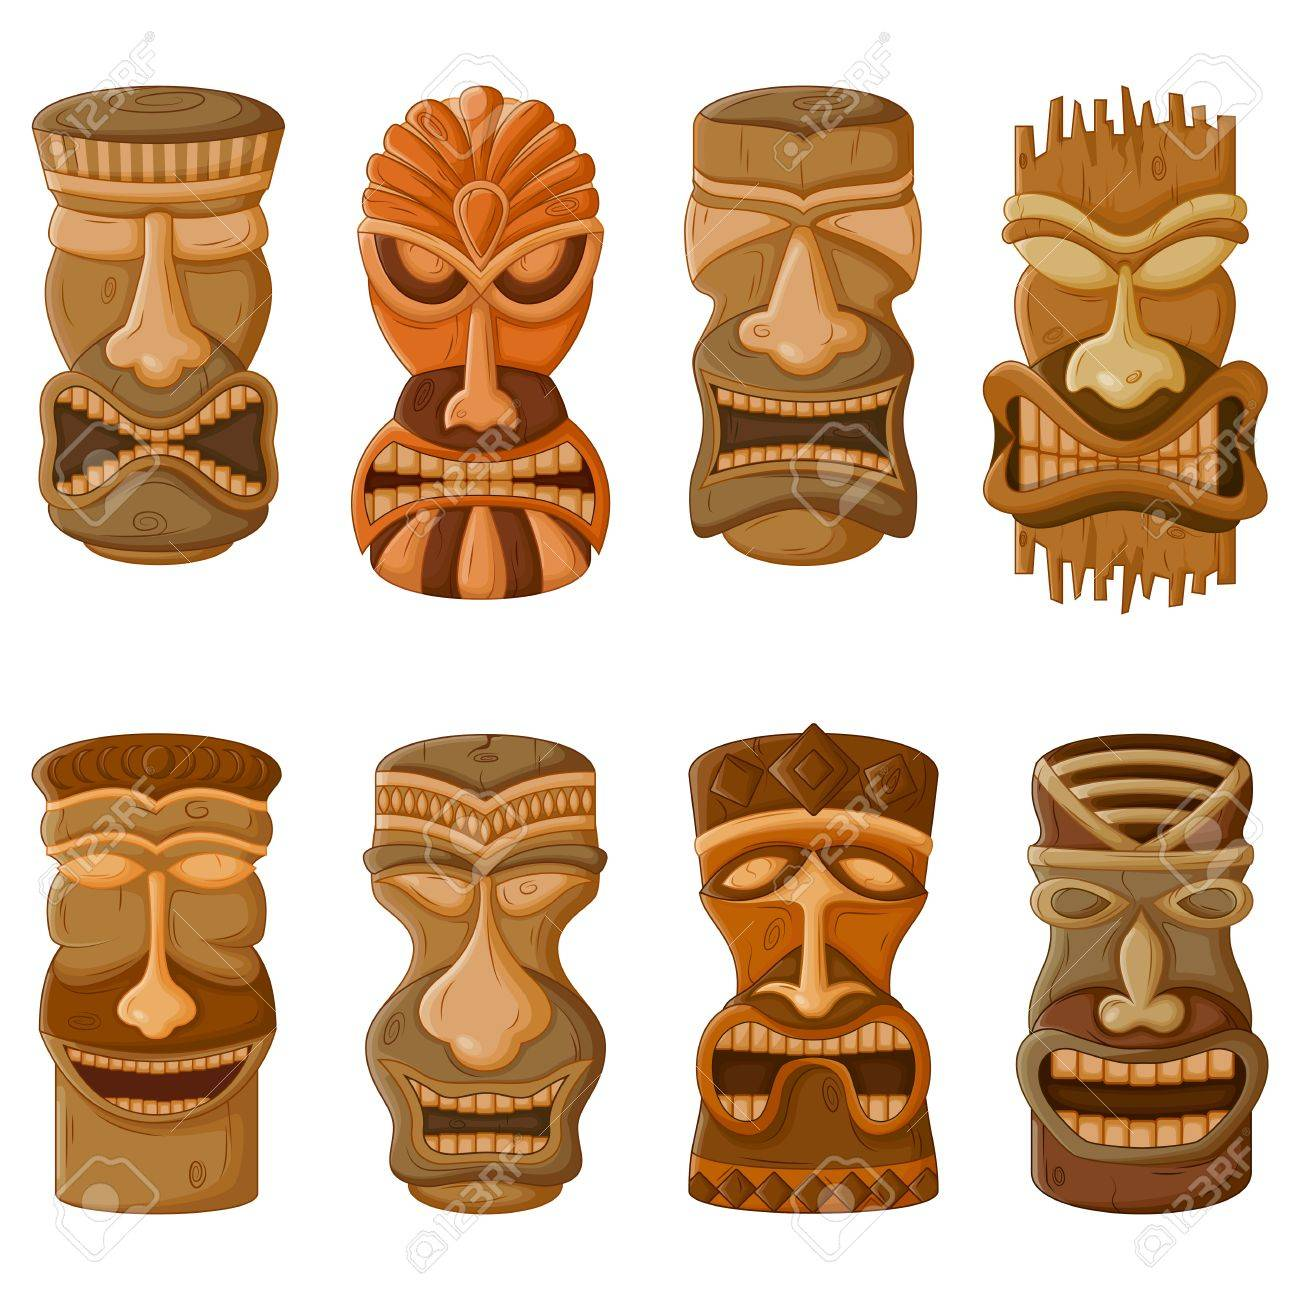 Vector design of Hawaiian Tiki tribal mask for religious or ethnic design - 62249901